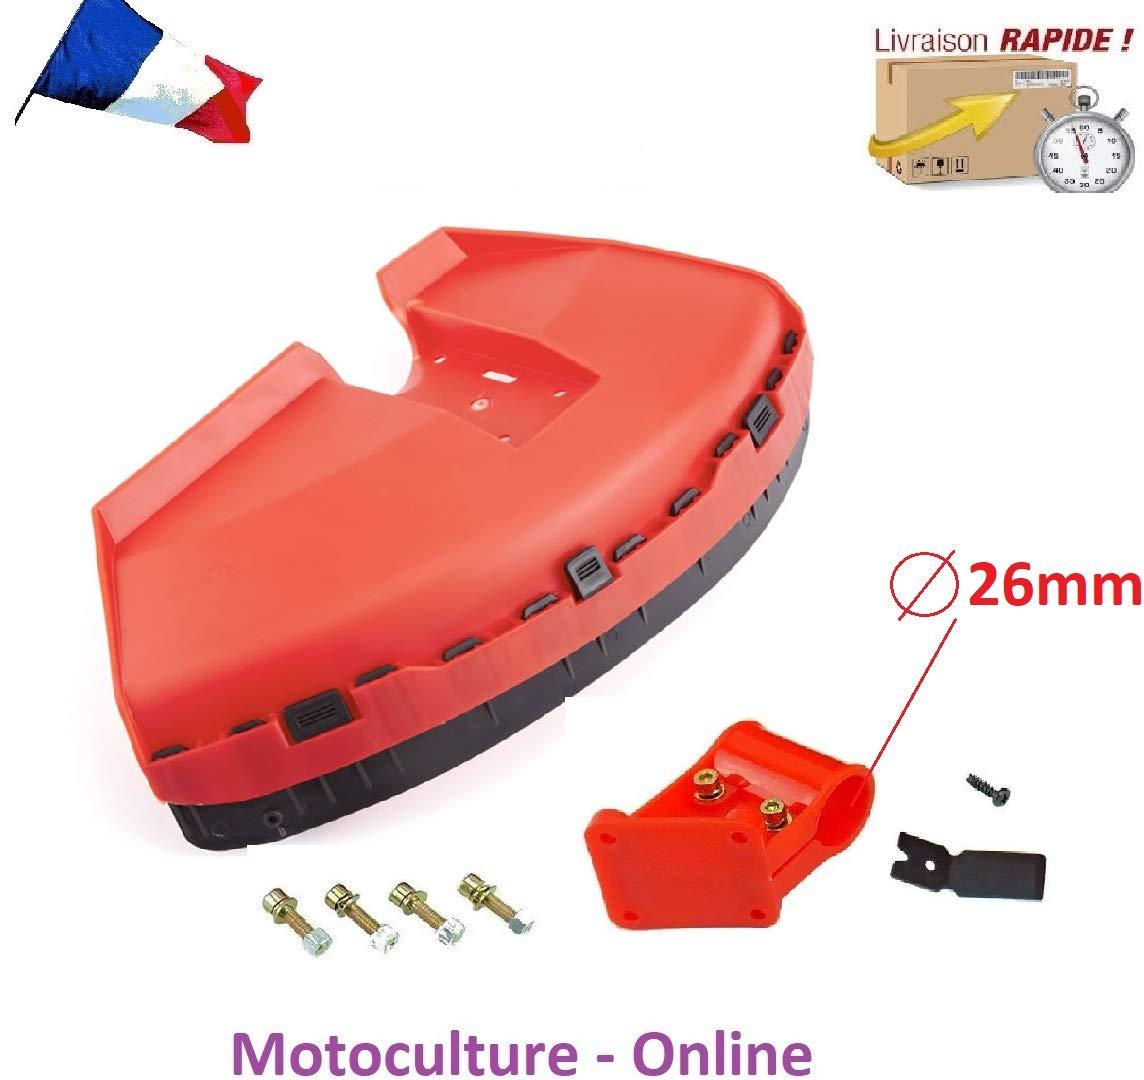 Motoculture-Online Carter de protección Inferior Completo para ...